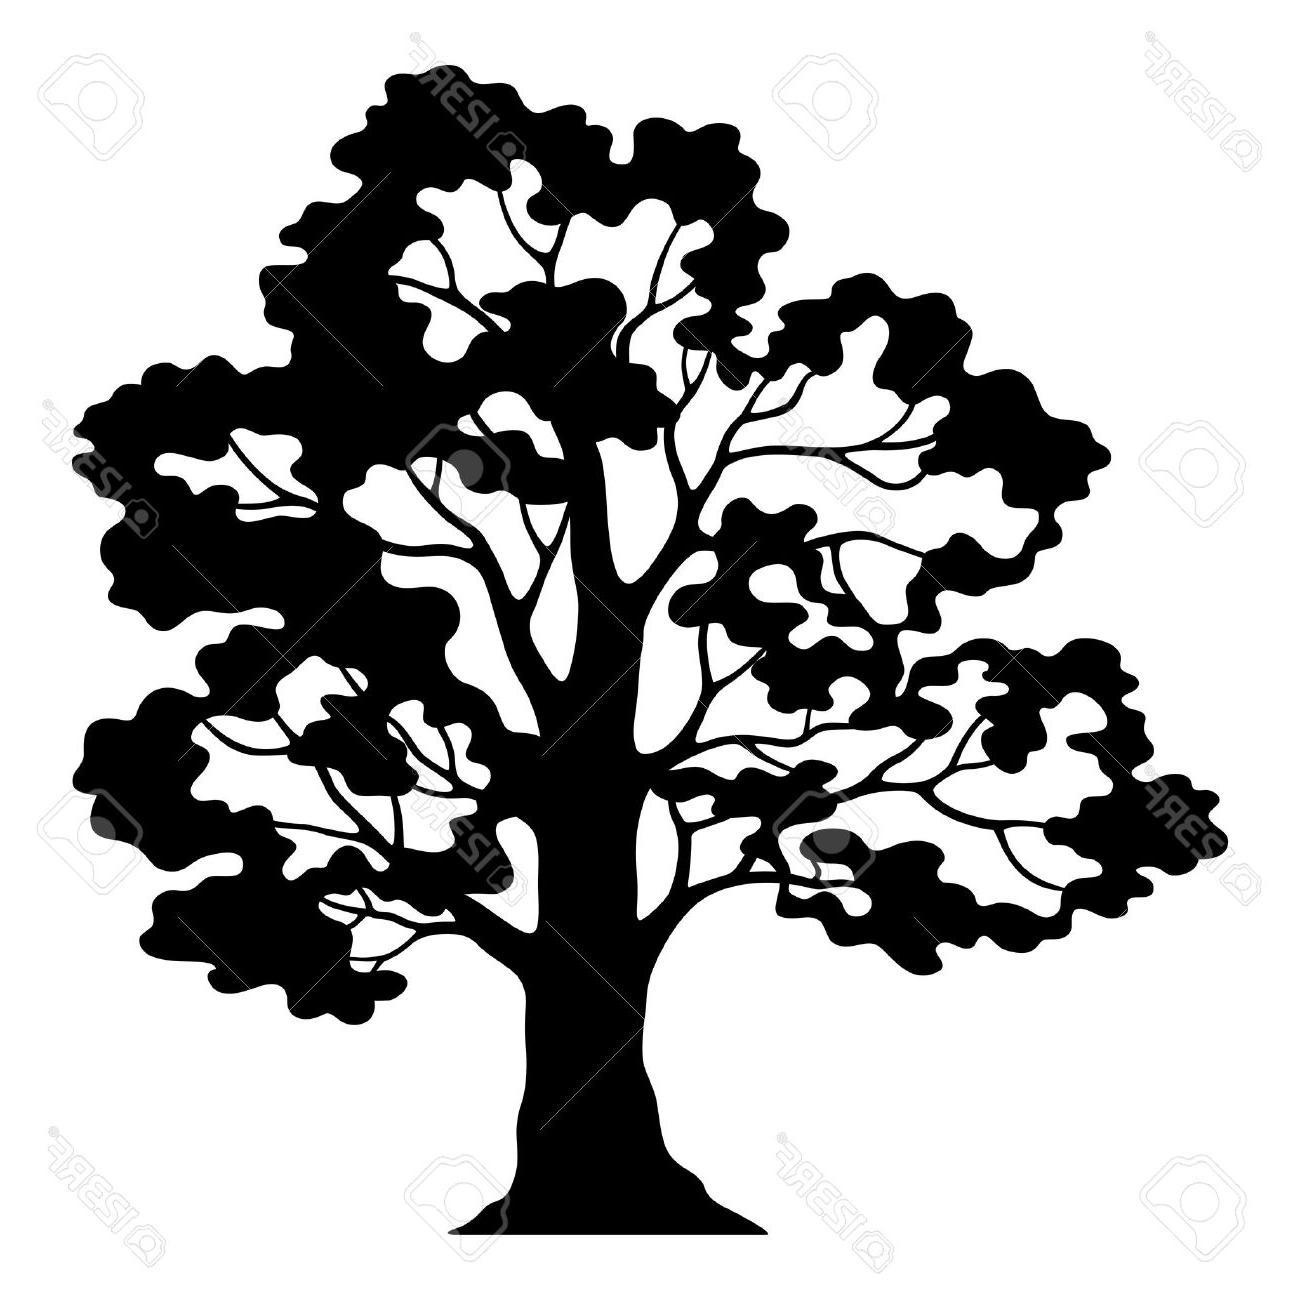 1300x1300 Hd Live Oak Tree Silhouette Clip Art Design Free Vector Art